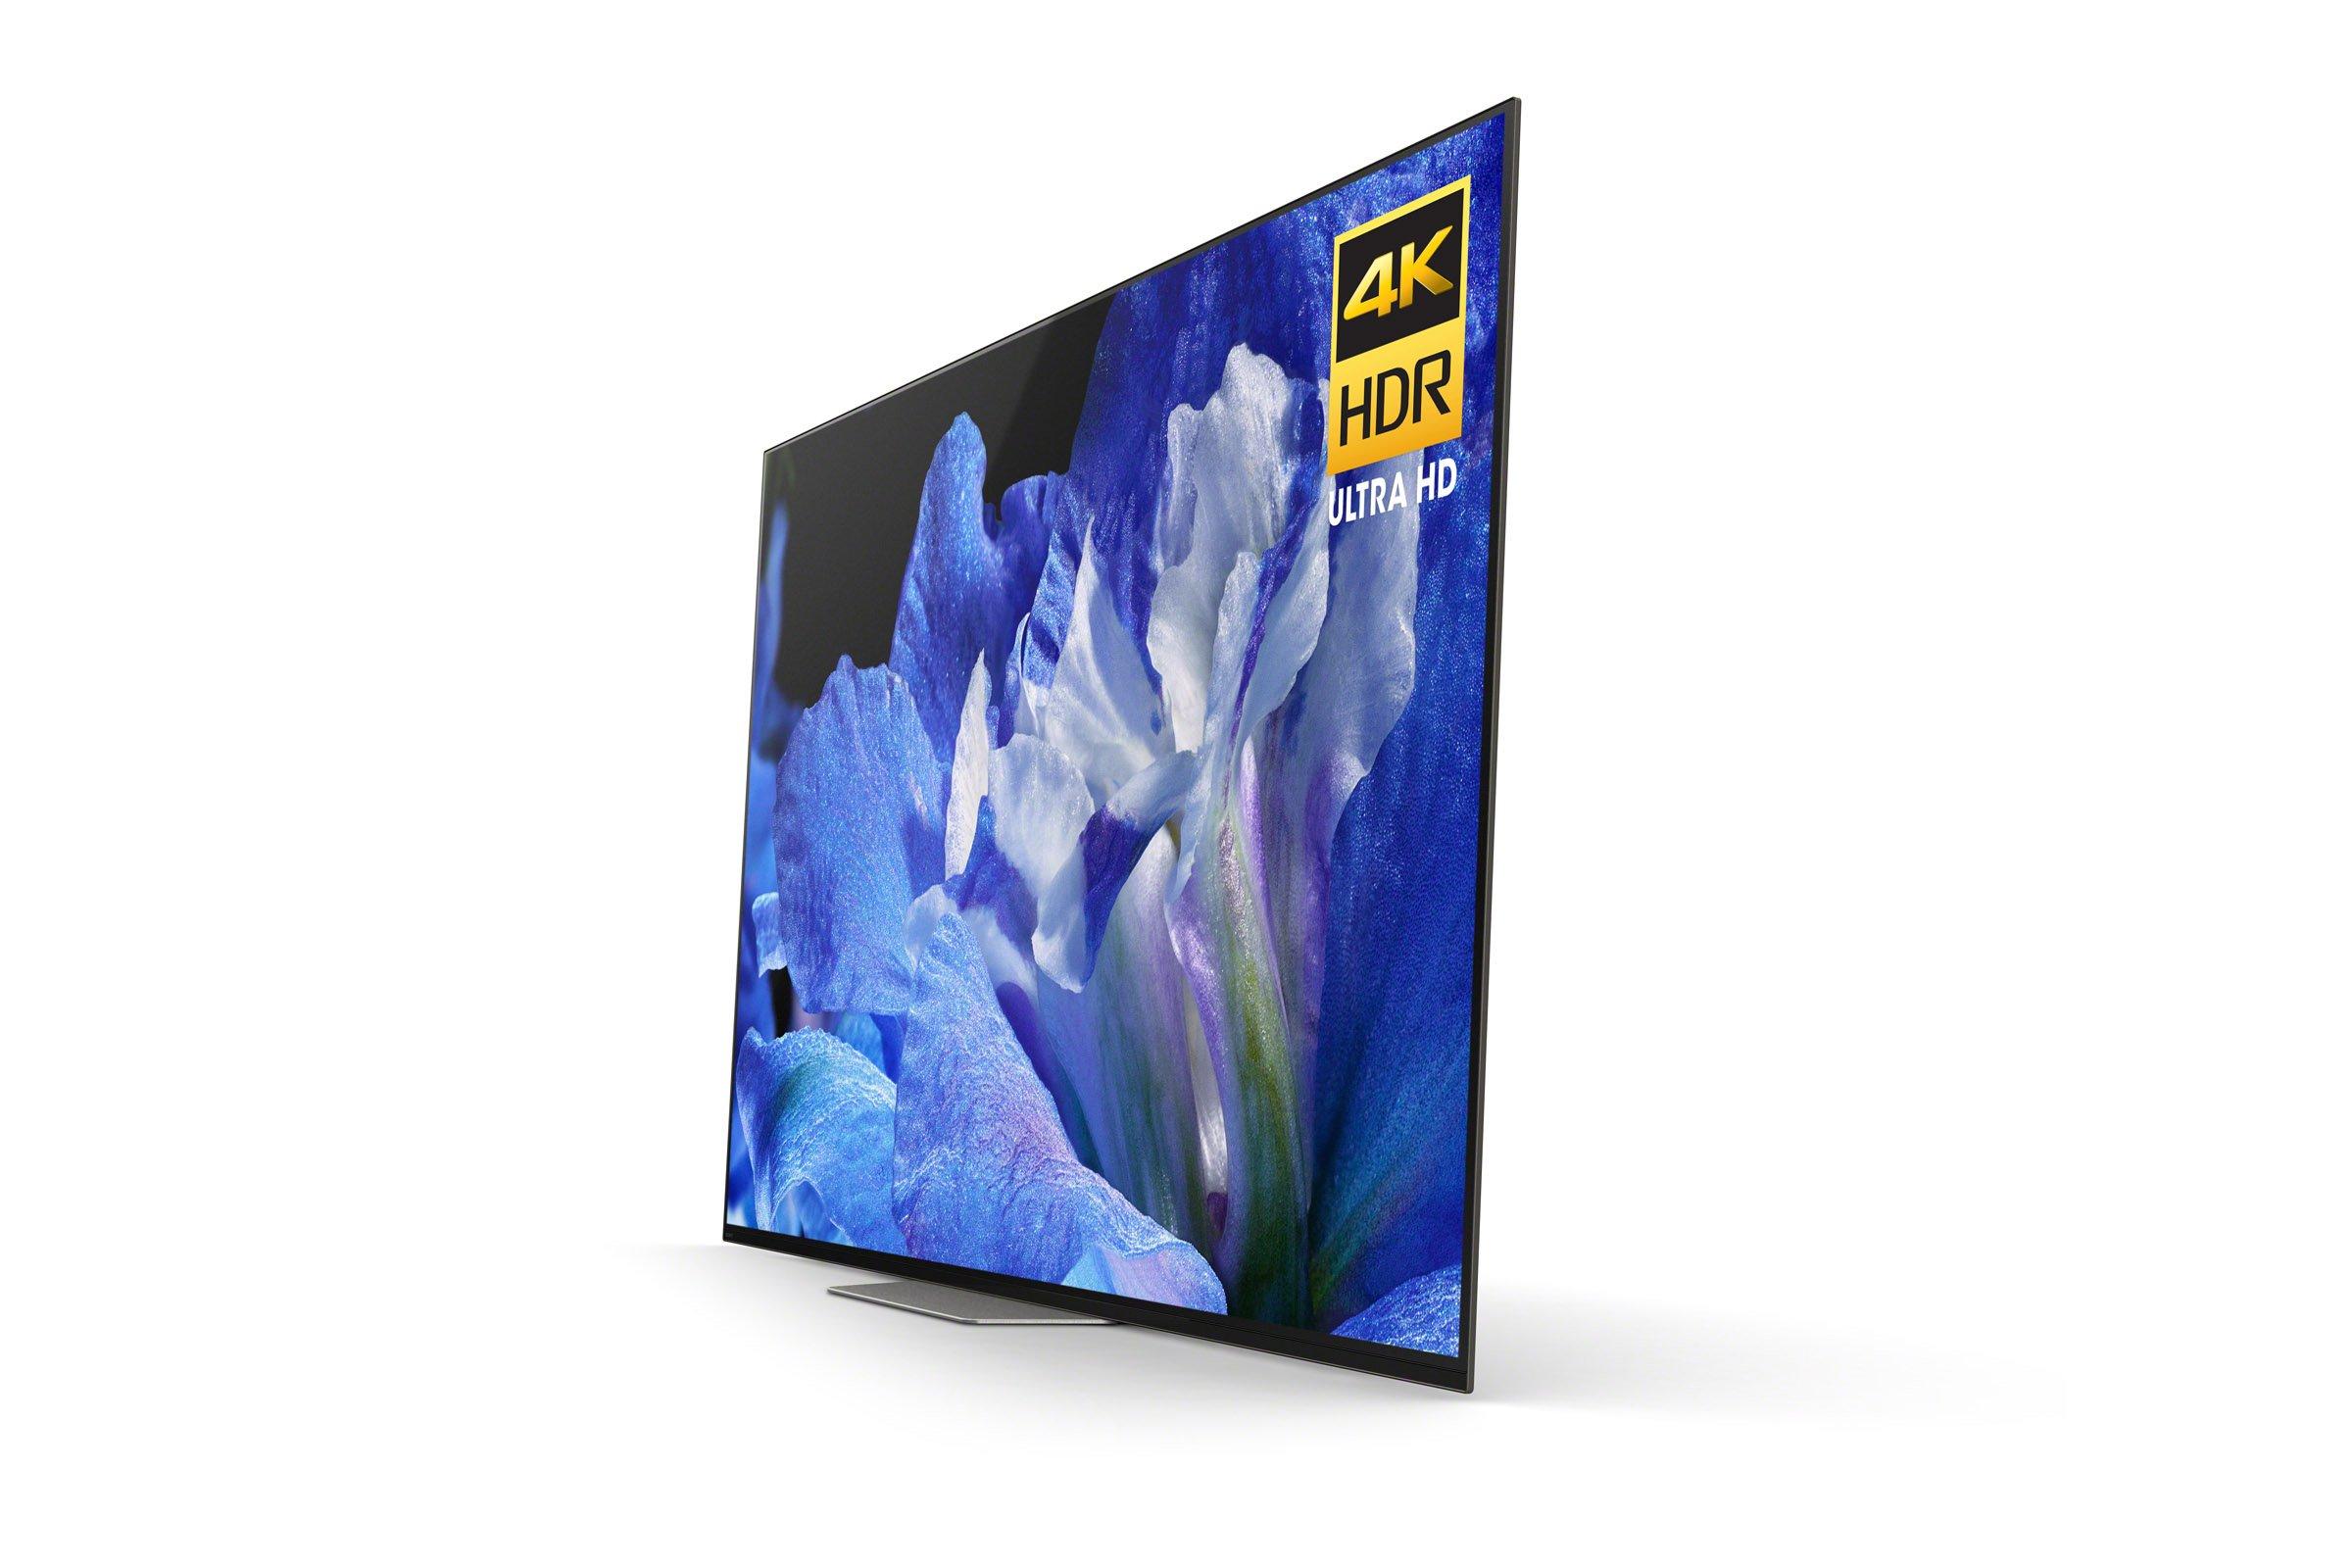 Sony XBR55A8F 4K Ultra HD Smart BRAVIA OLED TV (2018 Model) 2